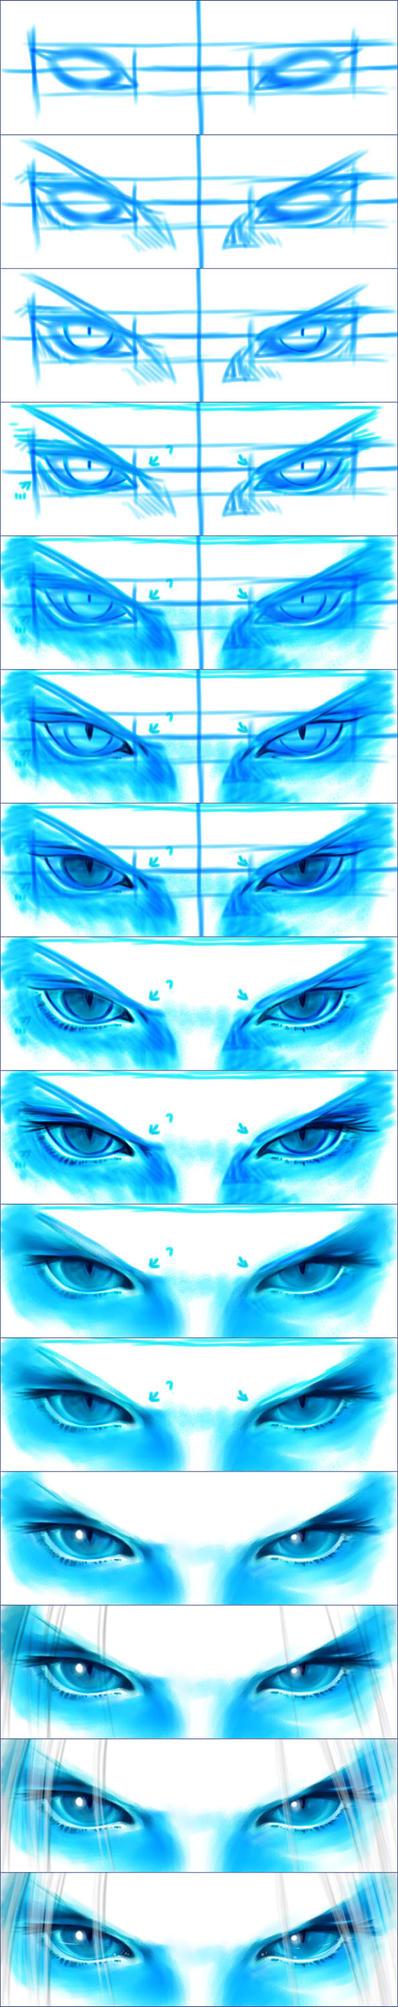 Sephiroth eyes steps by Washu-M